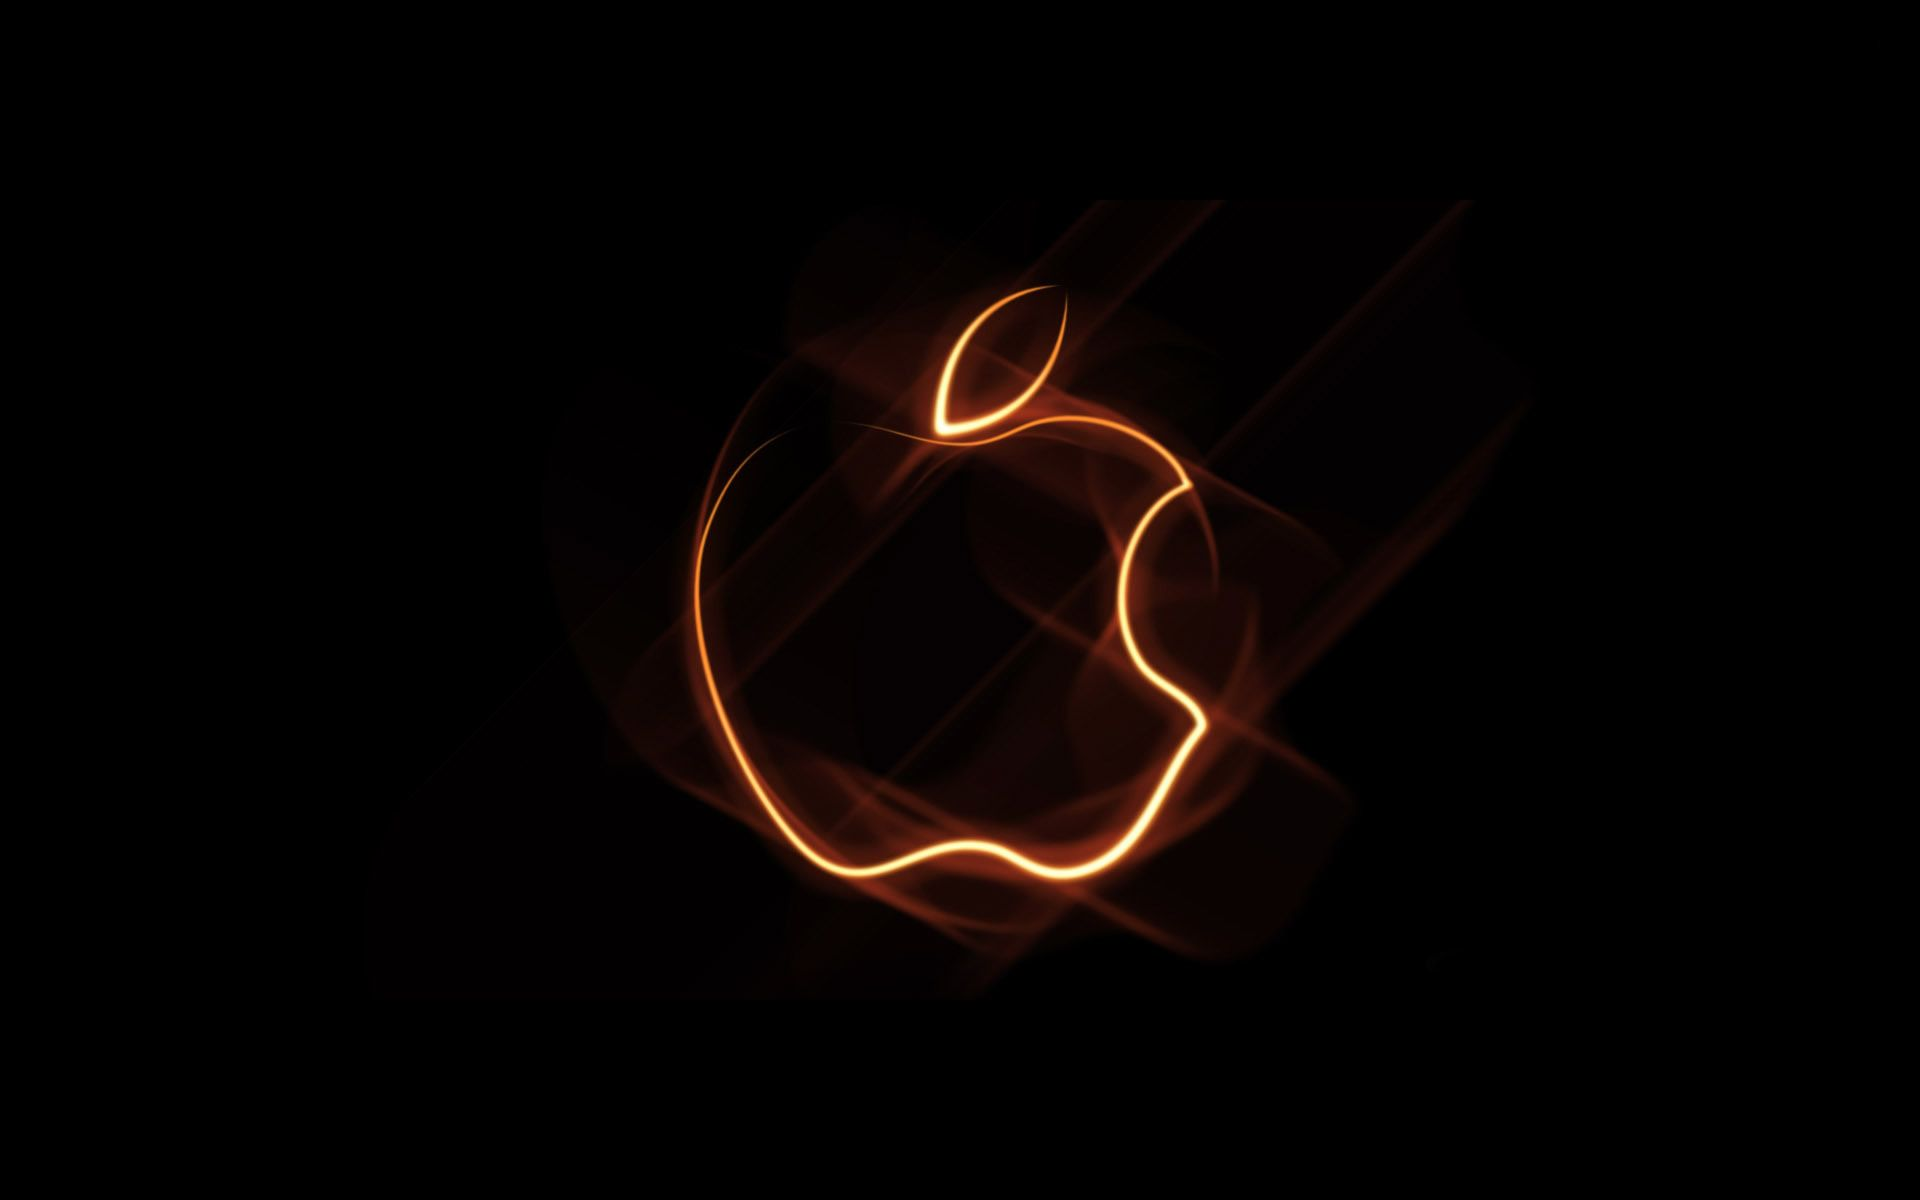 Apple Logo Wallpaper Wallpaper Background Hd Apple sign 19201200